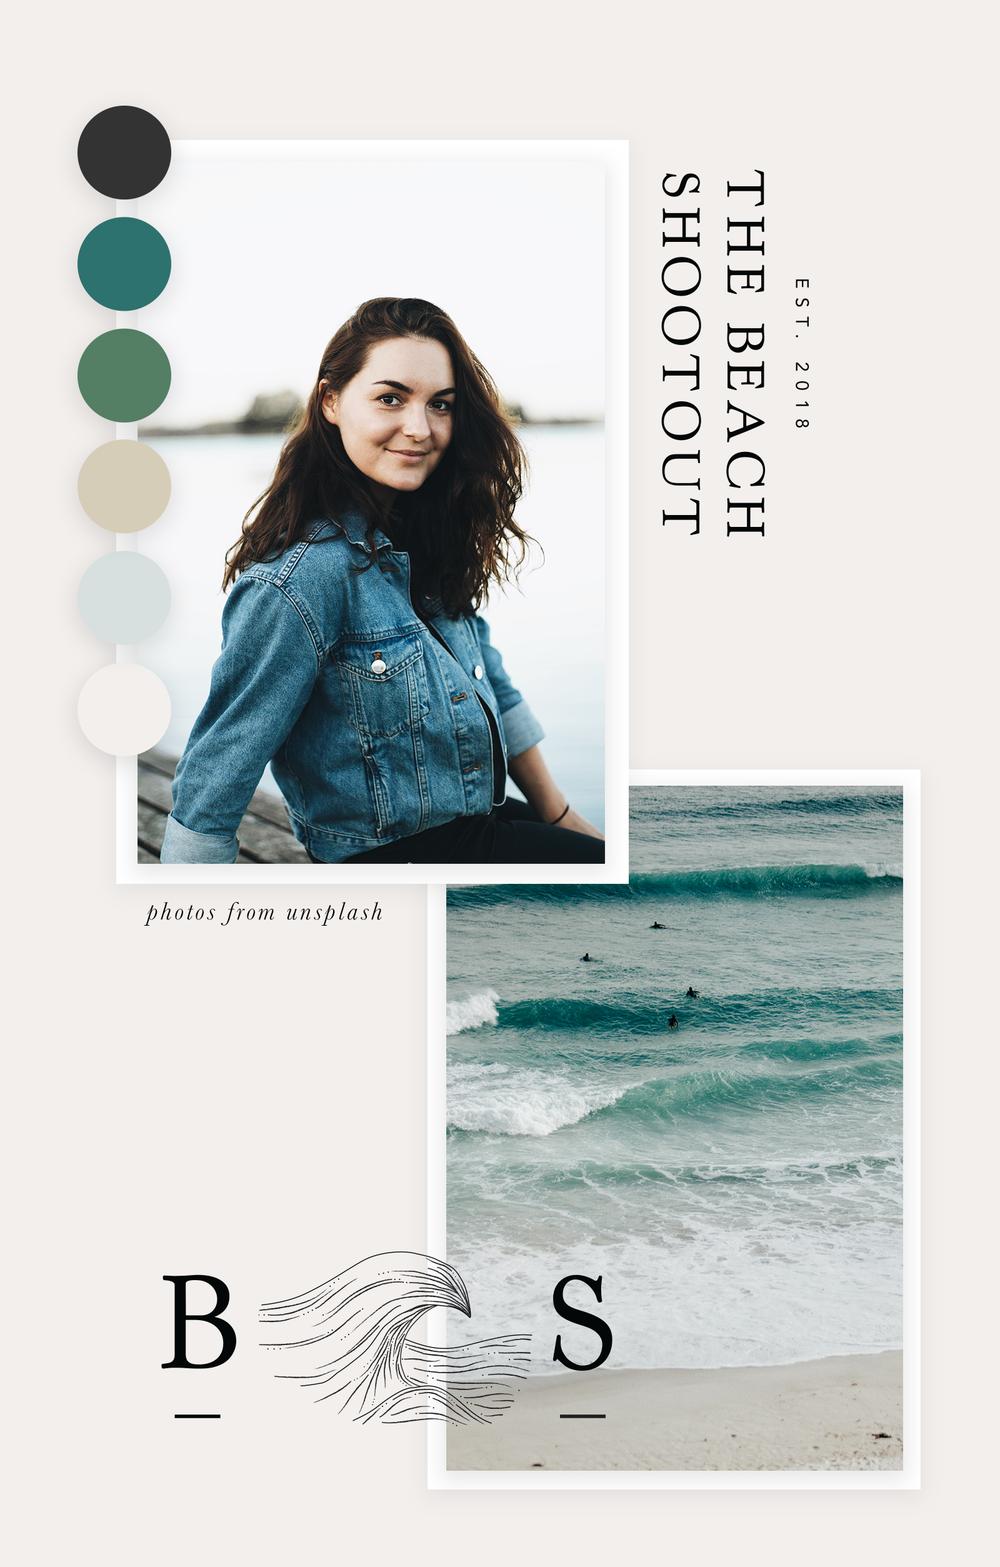 The Beach Shootout | The Shootout Society | Branding and Graphic Design for Female Entrepreneurs | Brand Identity Design | Branding Color Palette | Brand Design Inspiration | Brand Board | Color Palette Inspiration | Minimalist Brand Design | Branding Board | Logo Design Inspiration | Visual Identity | Brand Guidelines | Molly Ho Studio